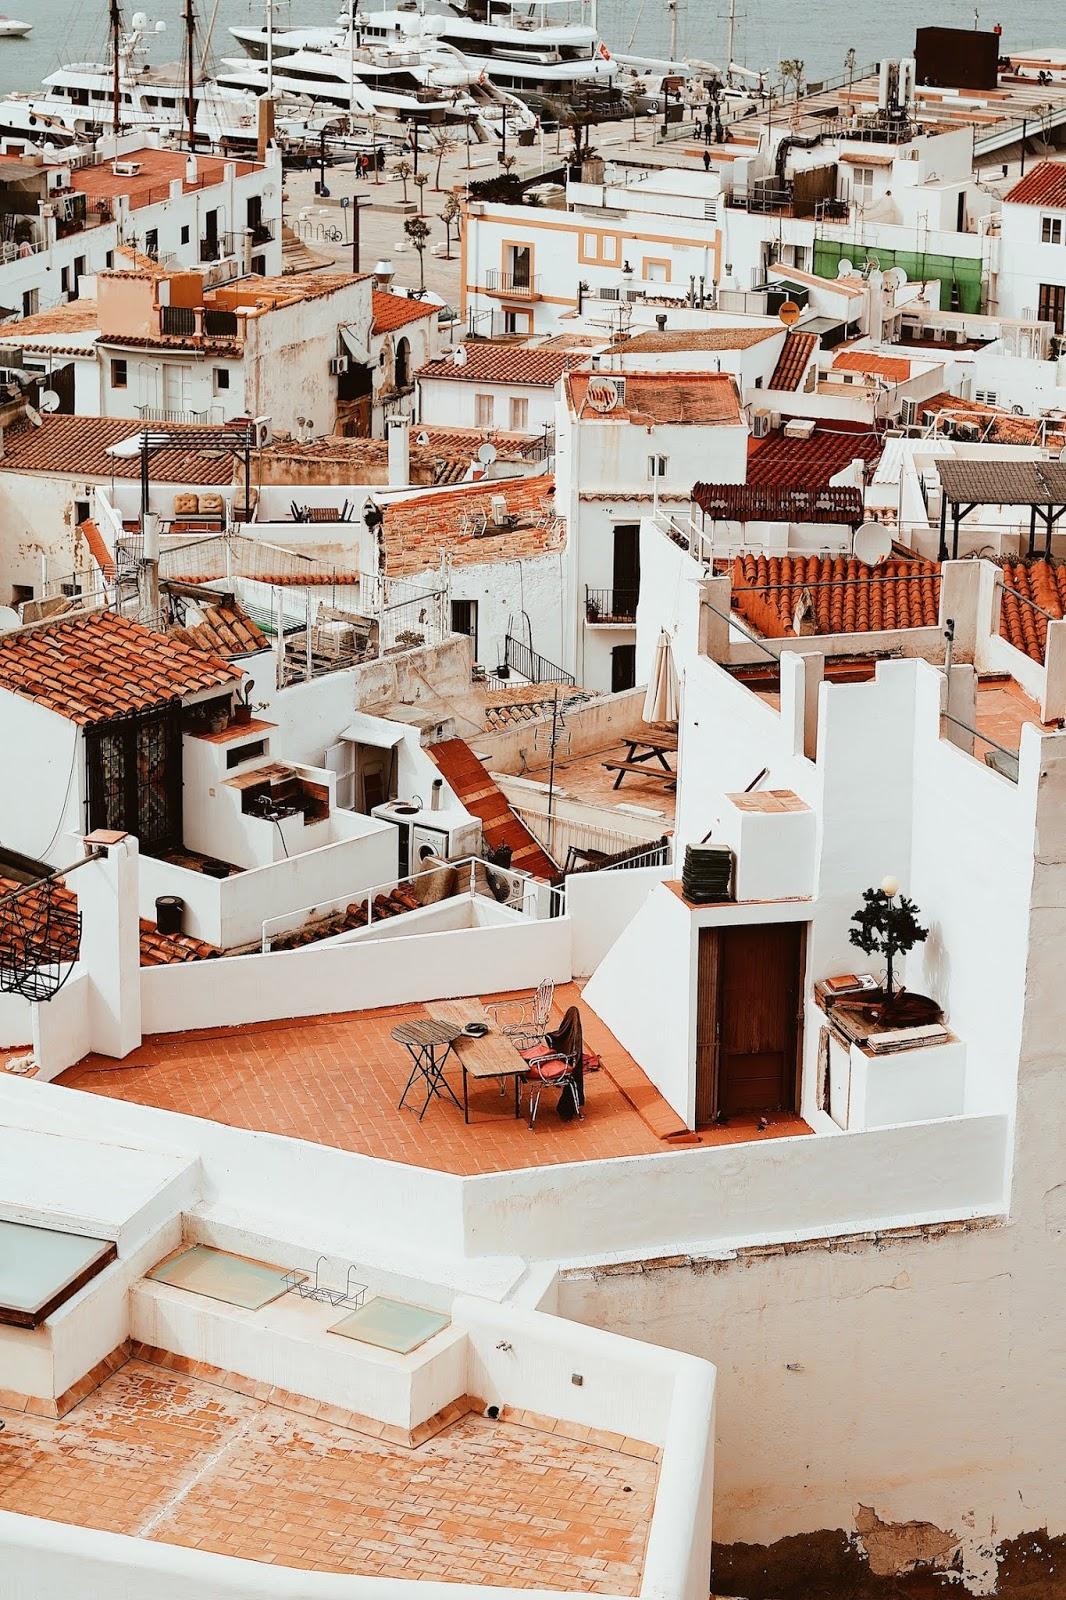 Ibiza architektura na wyspie